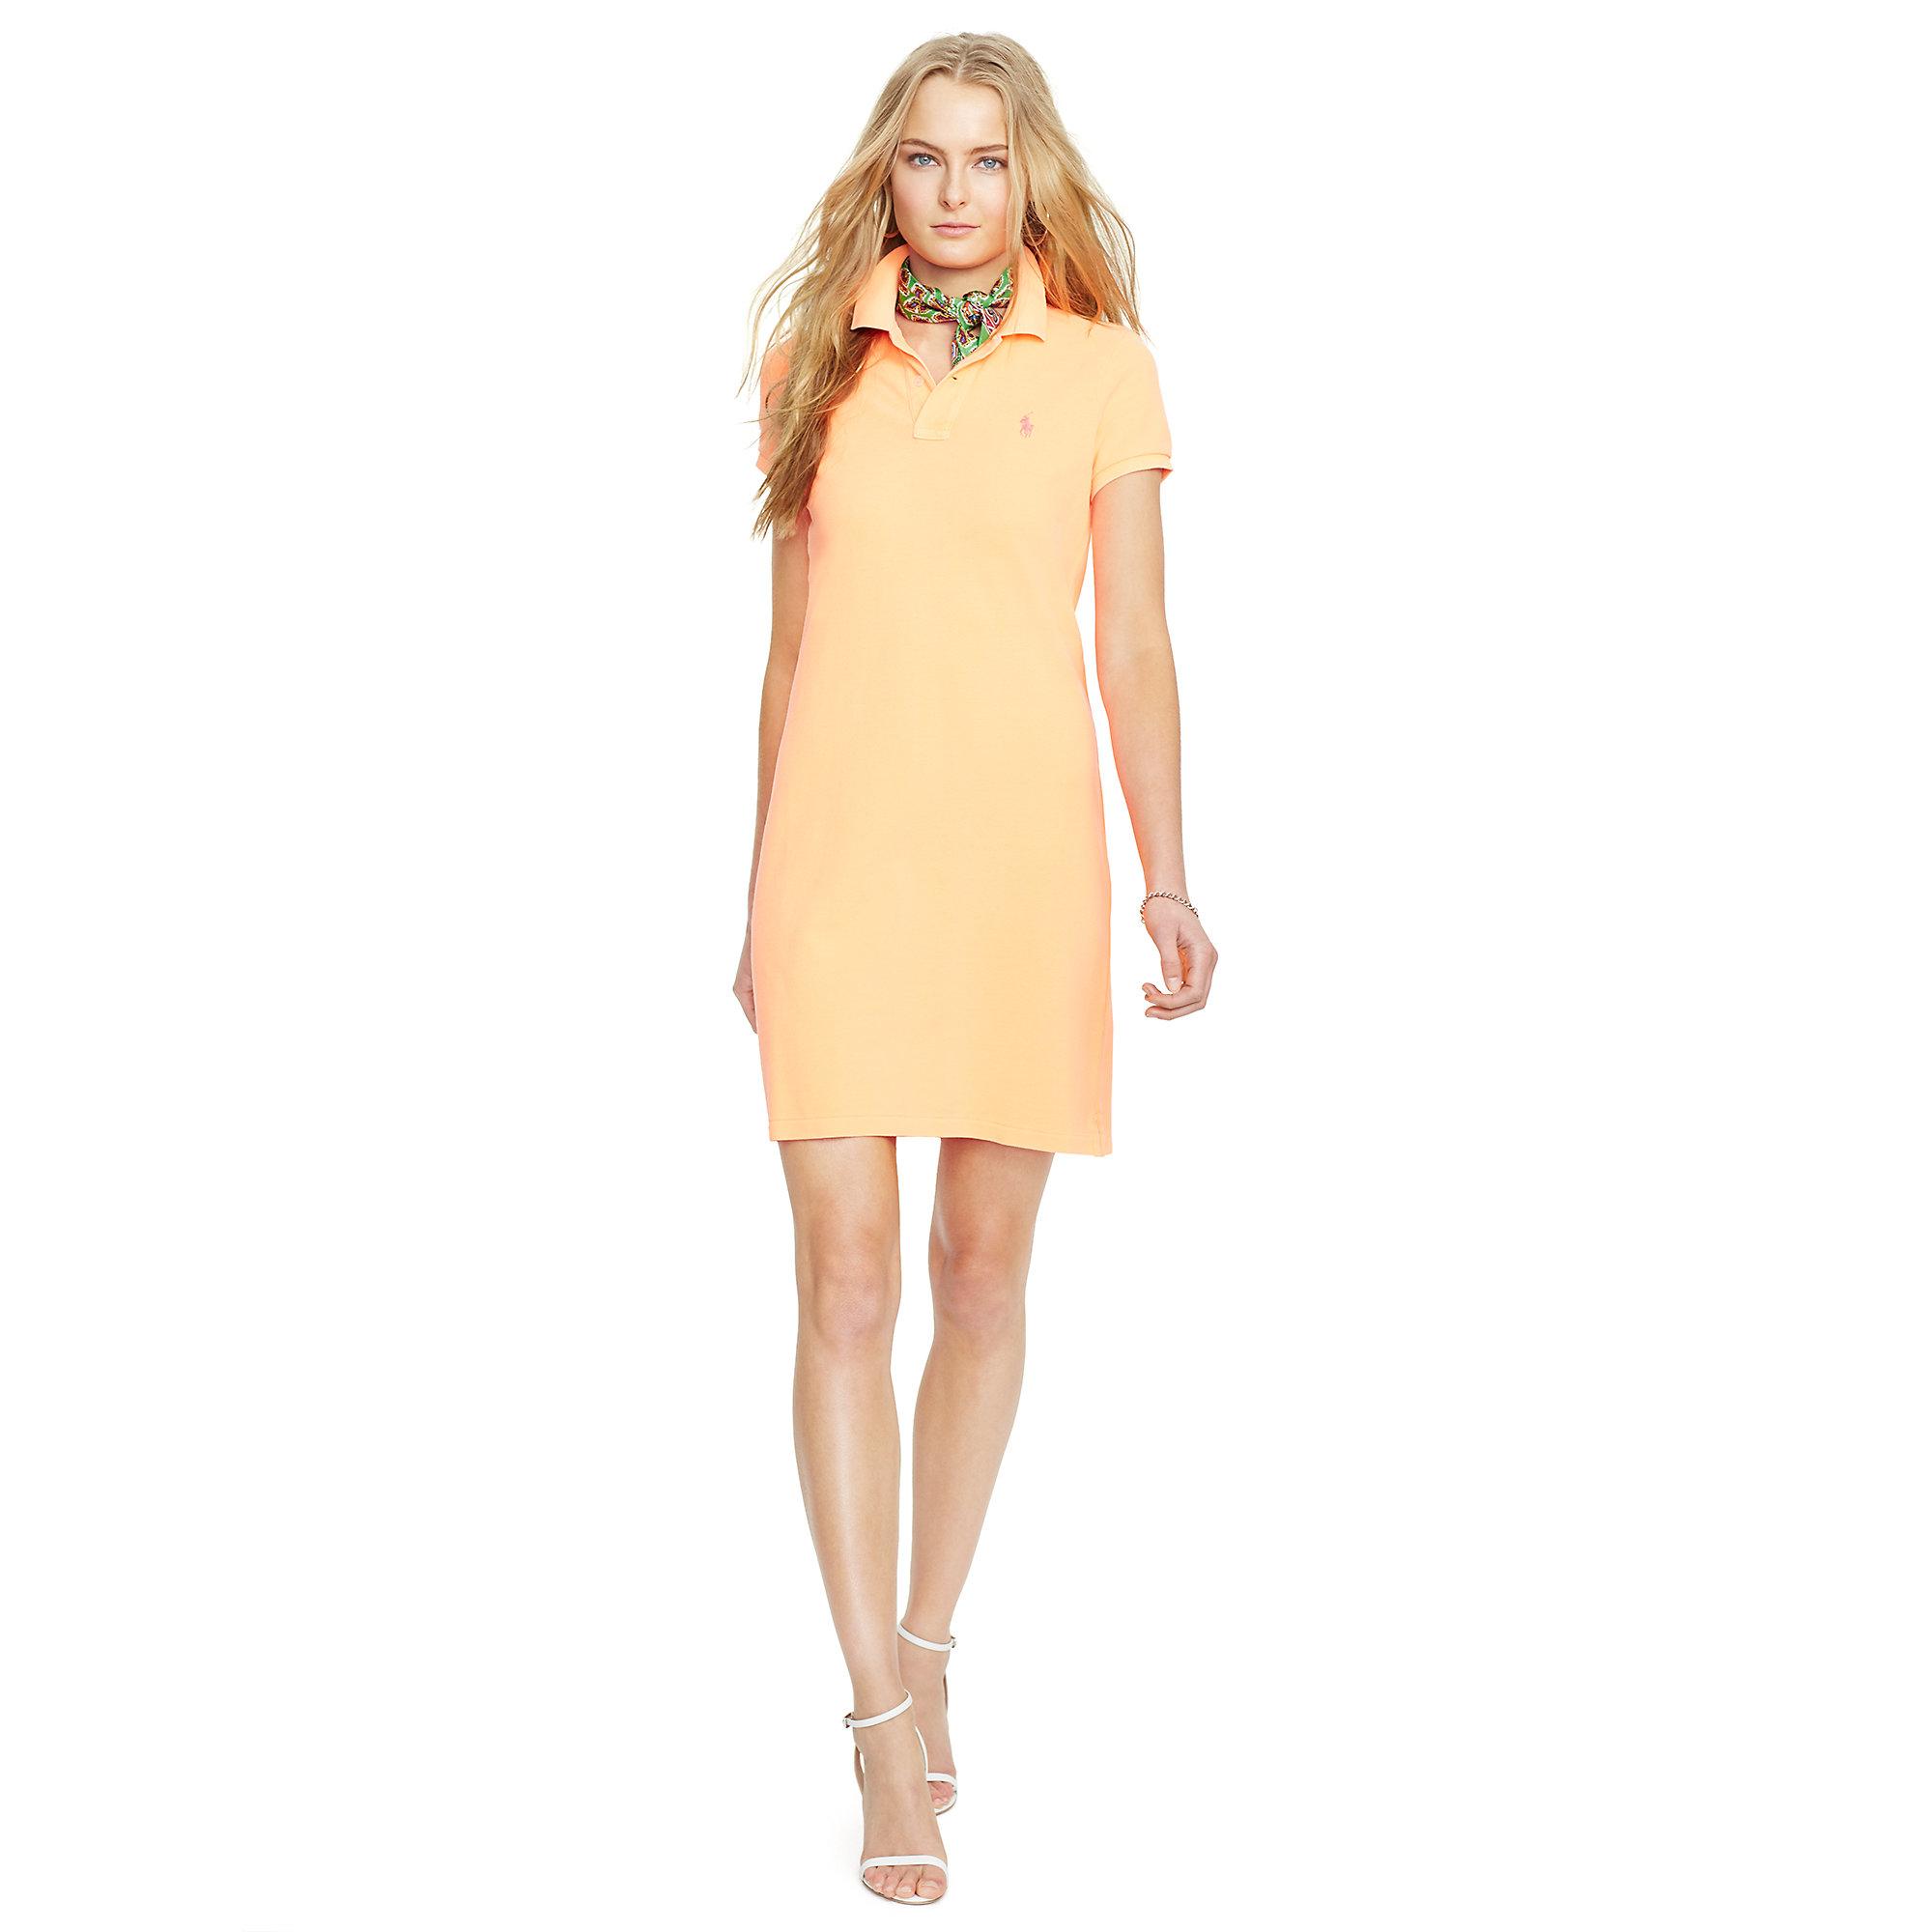 Polo ralph lauren Cotton Mesh Polo Dress in Orange | Lyst